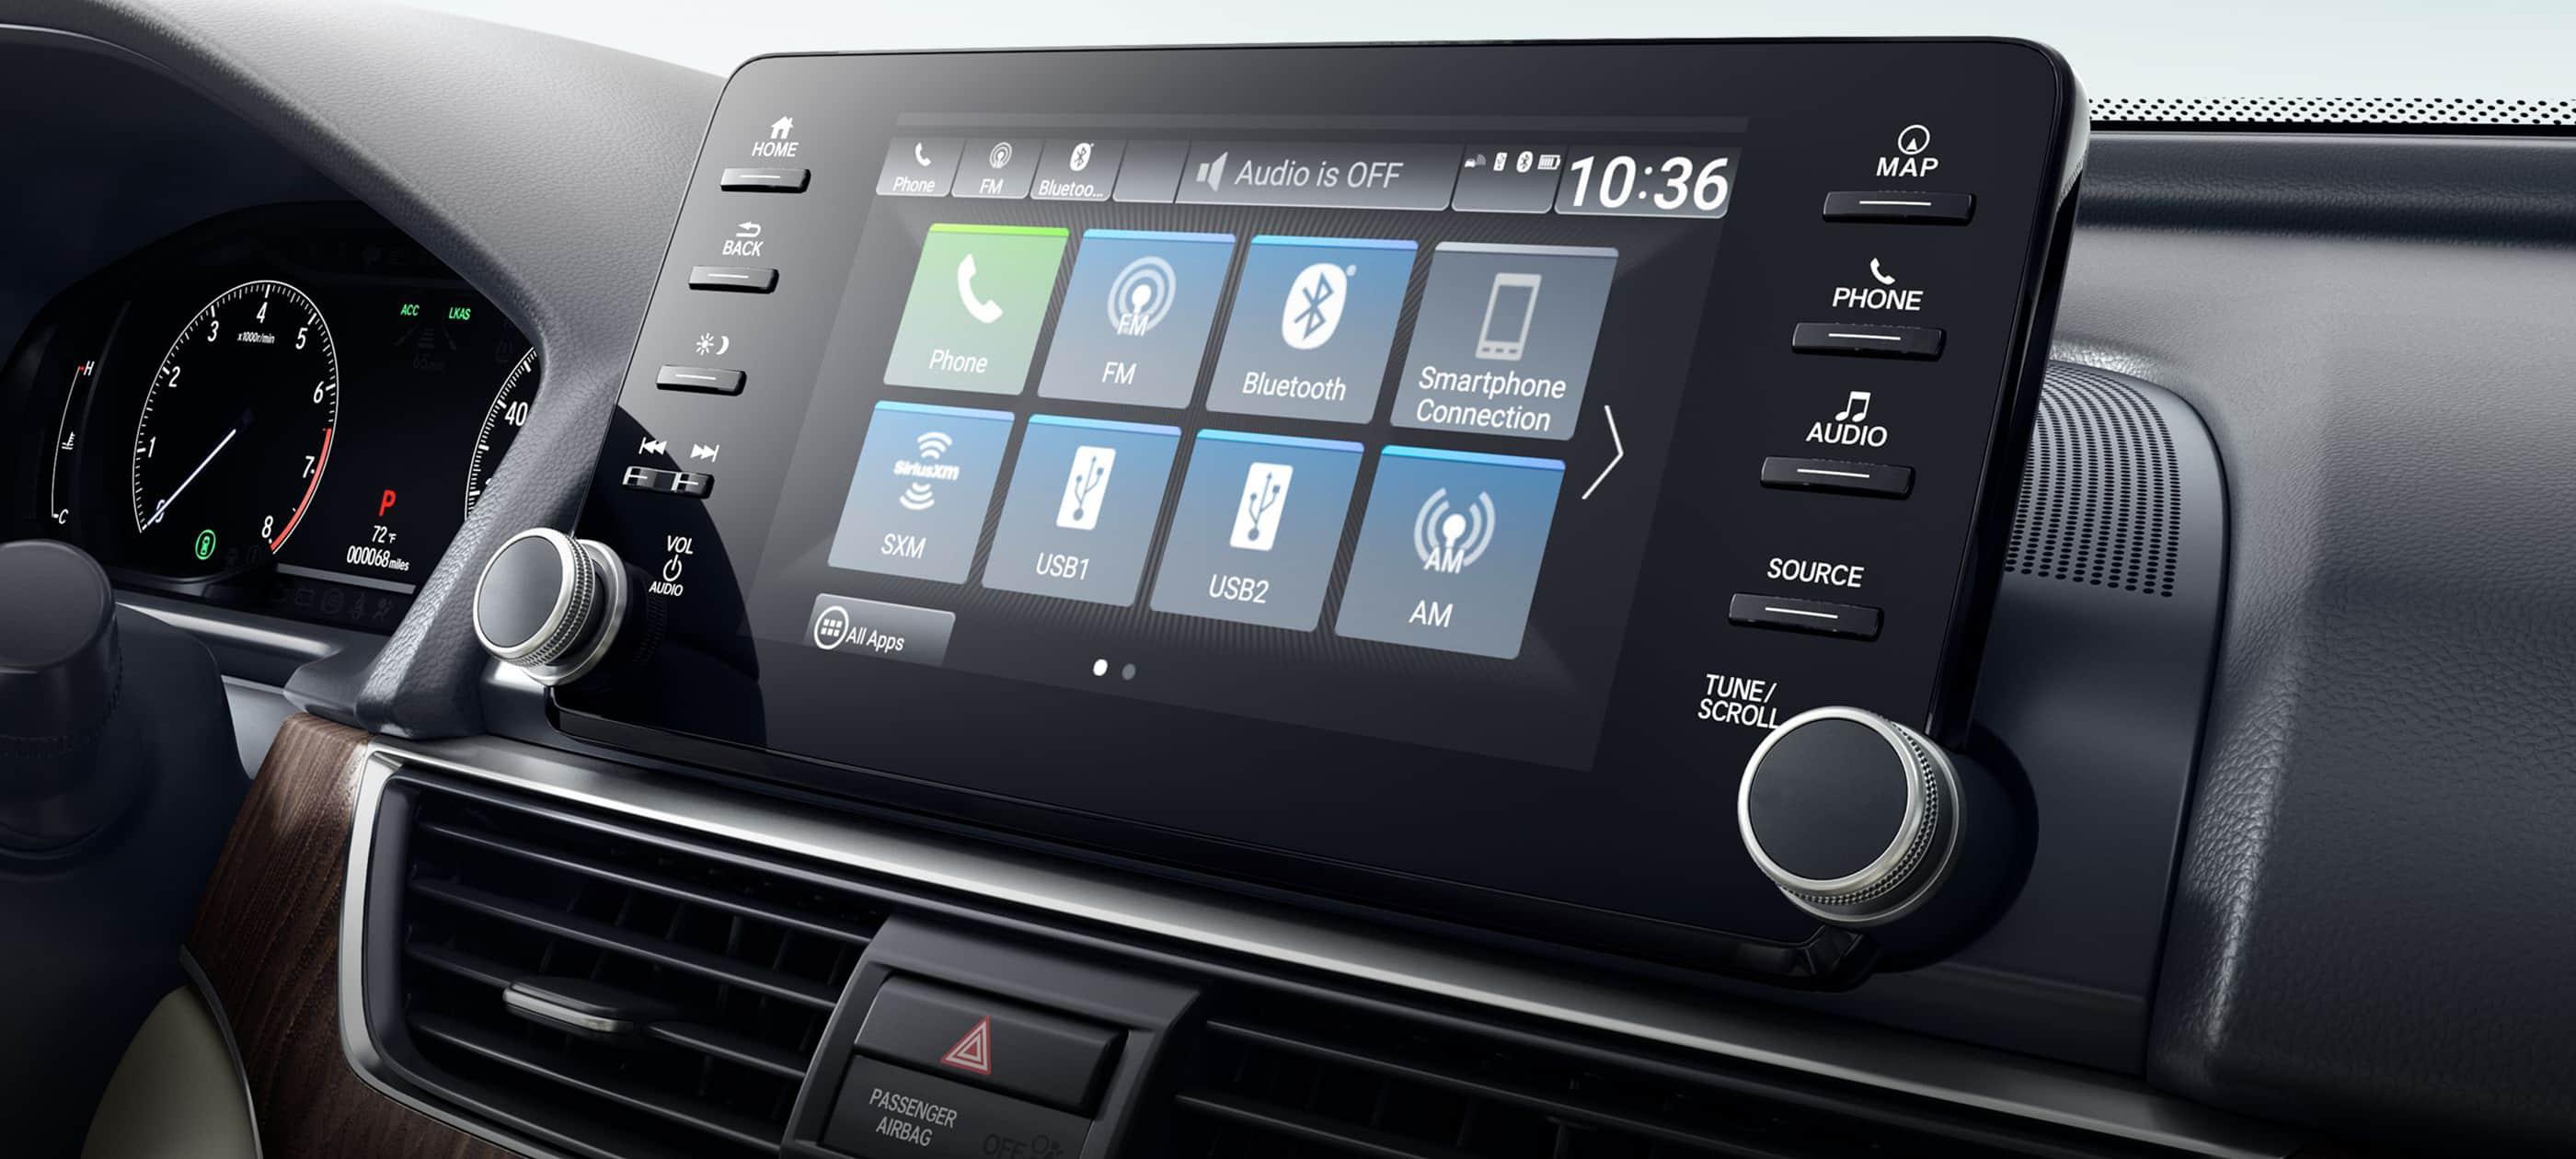 Integración con Android Auto™